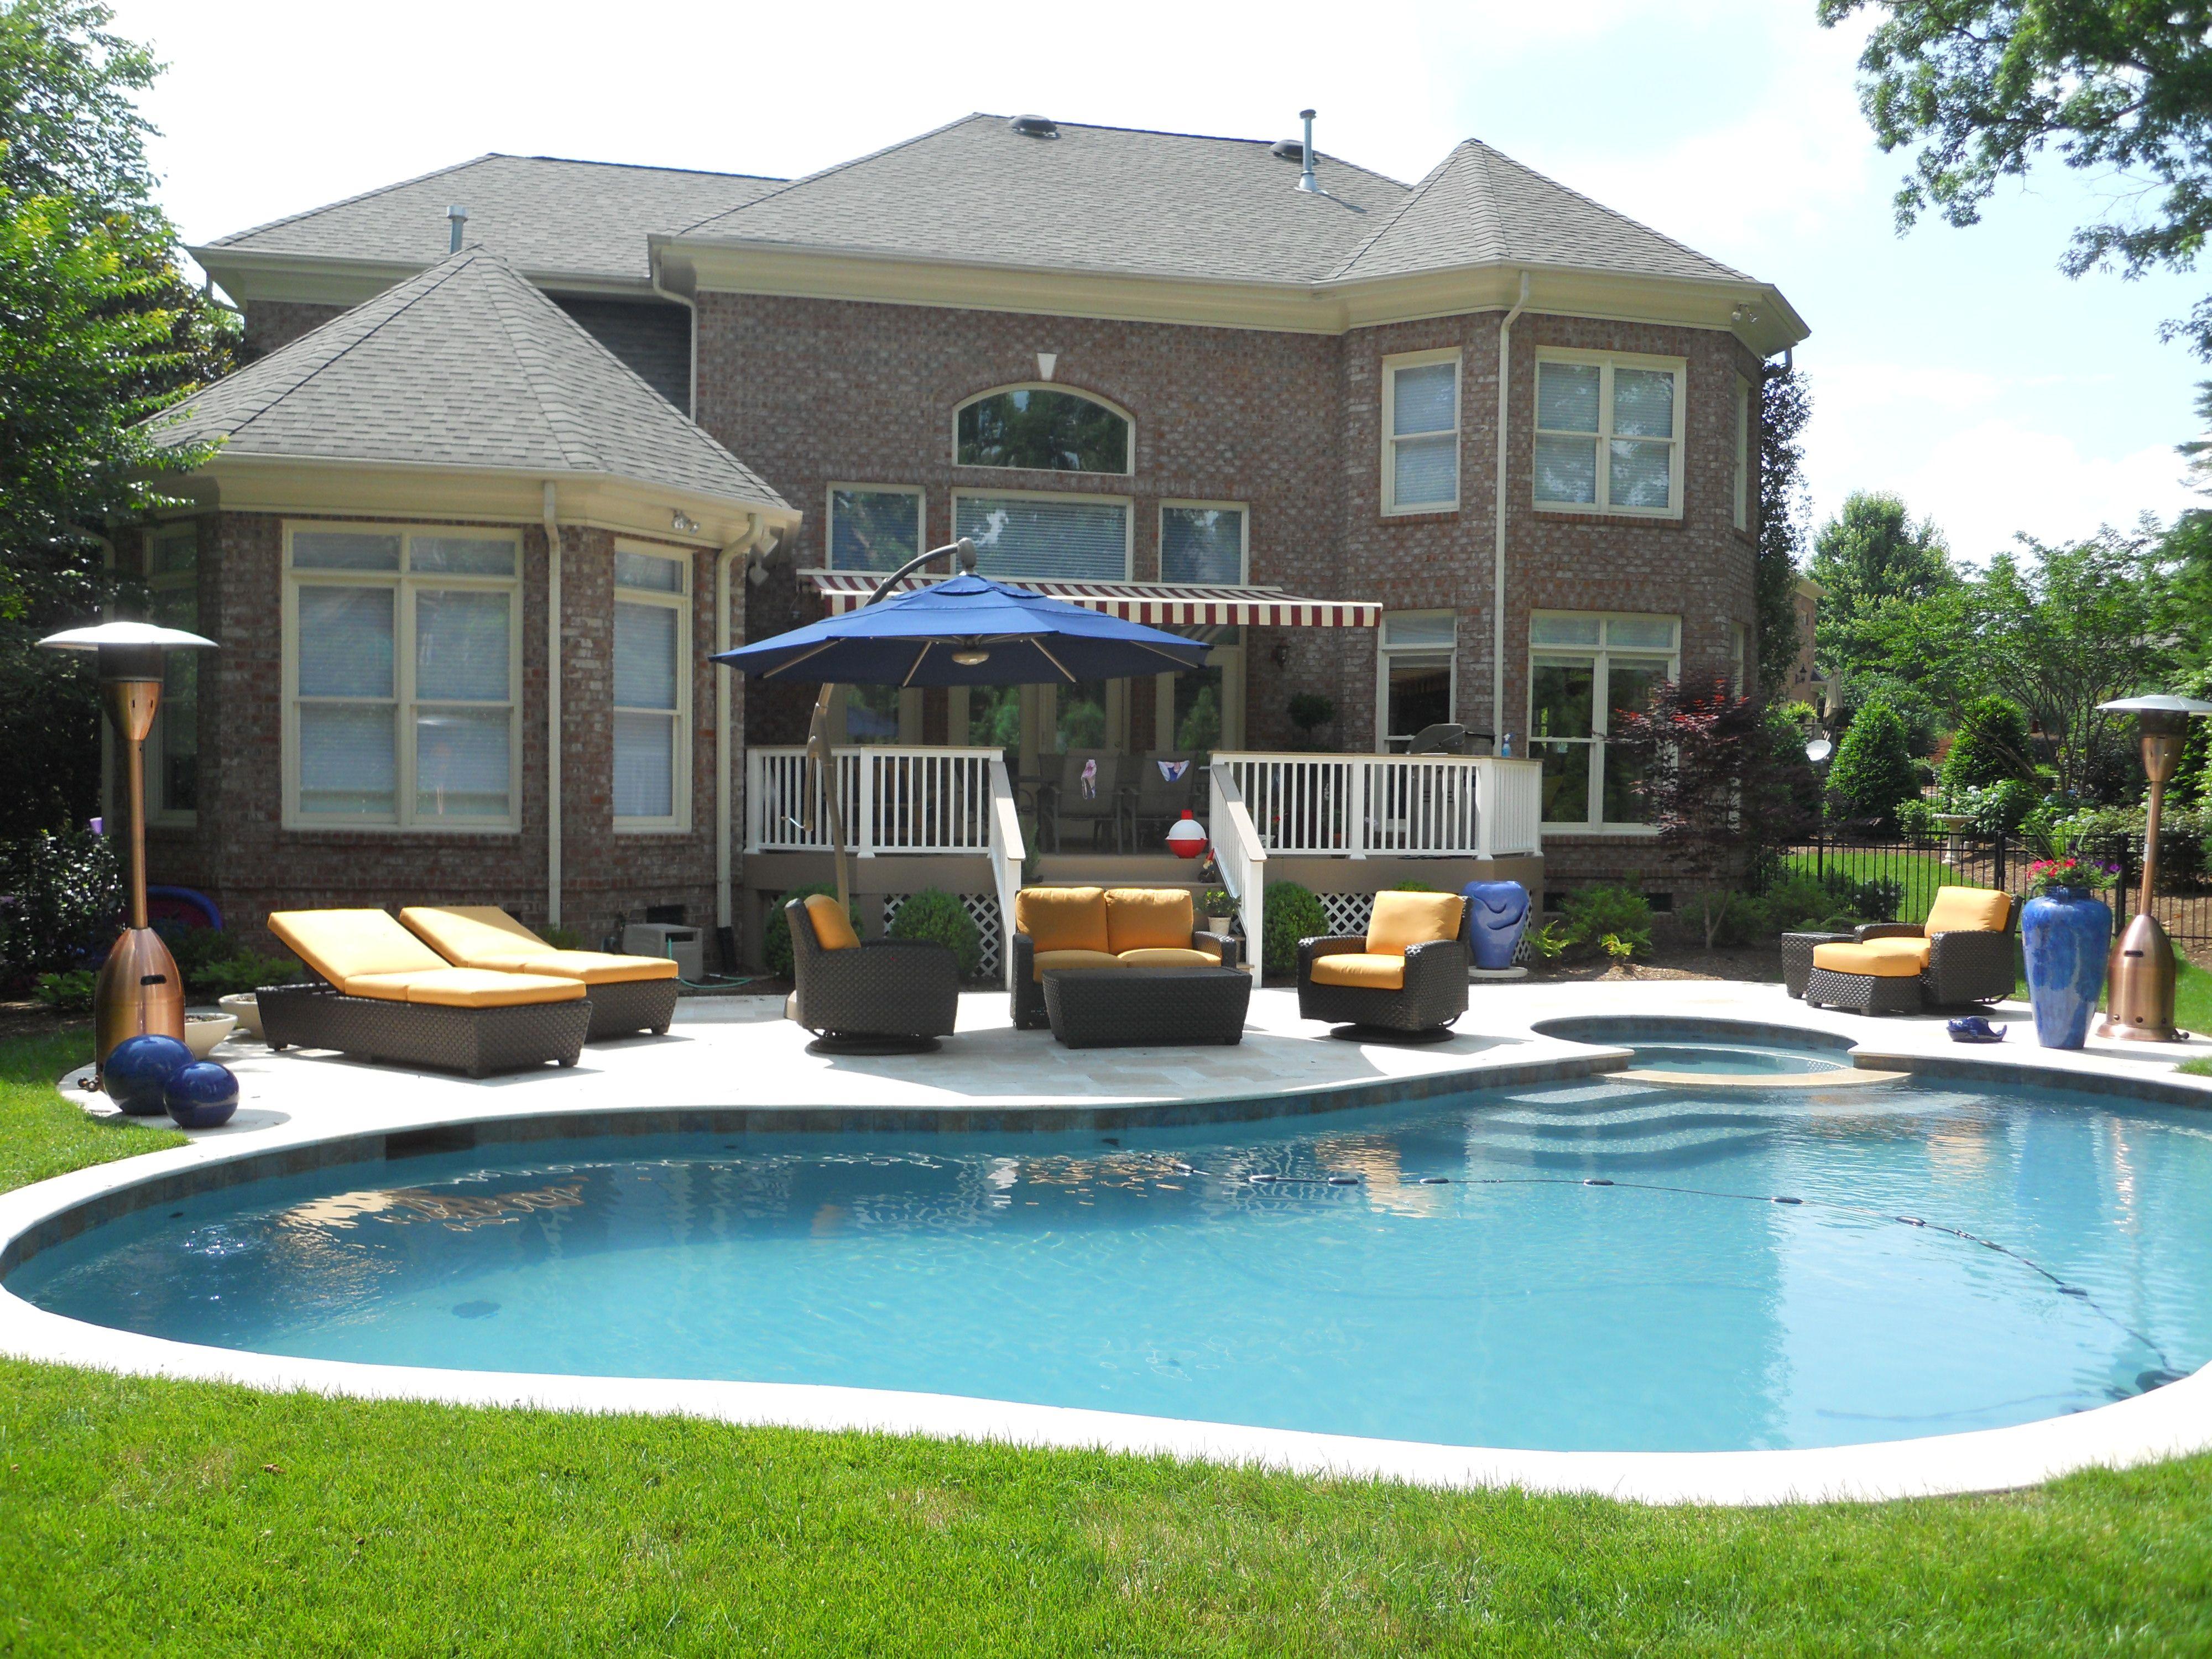 backyard pool and playground google search pool ideas